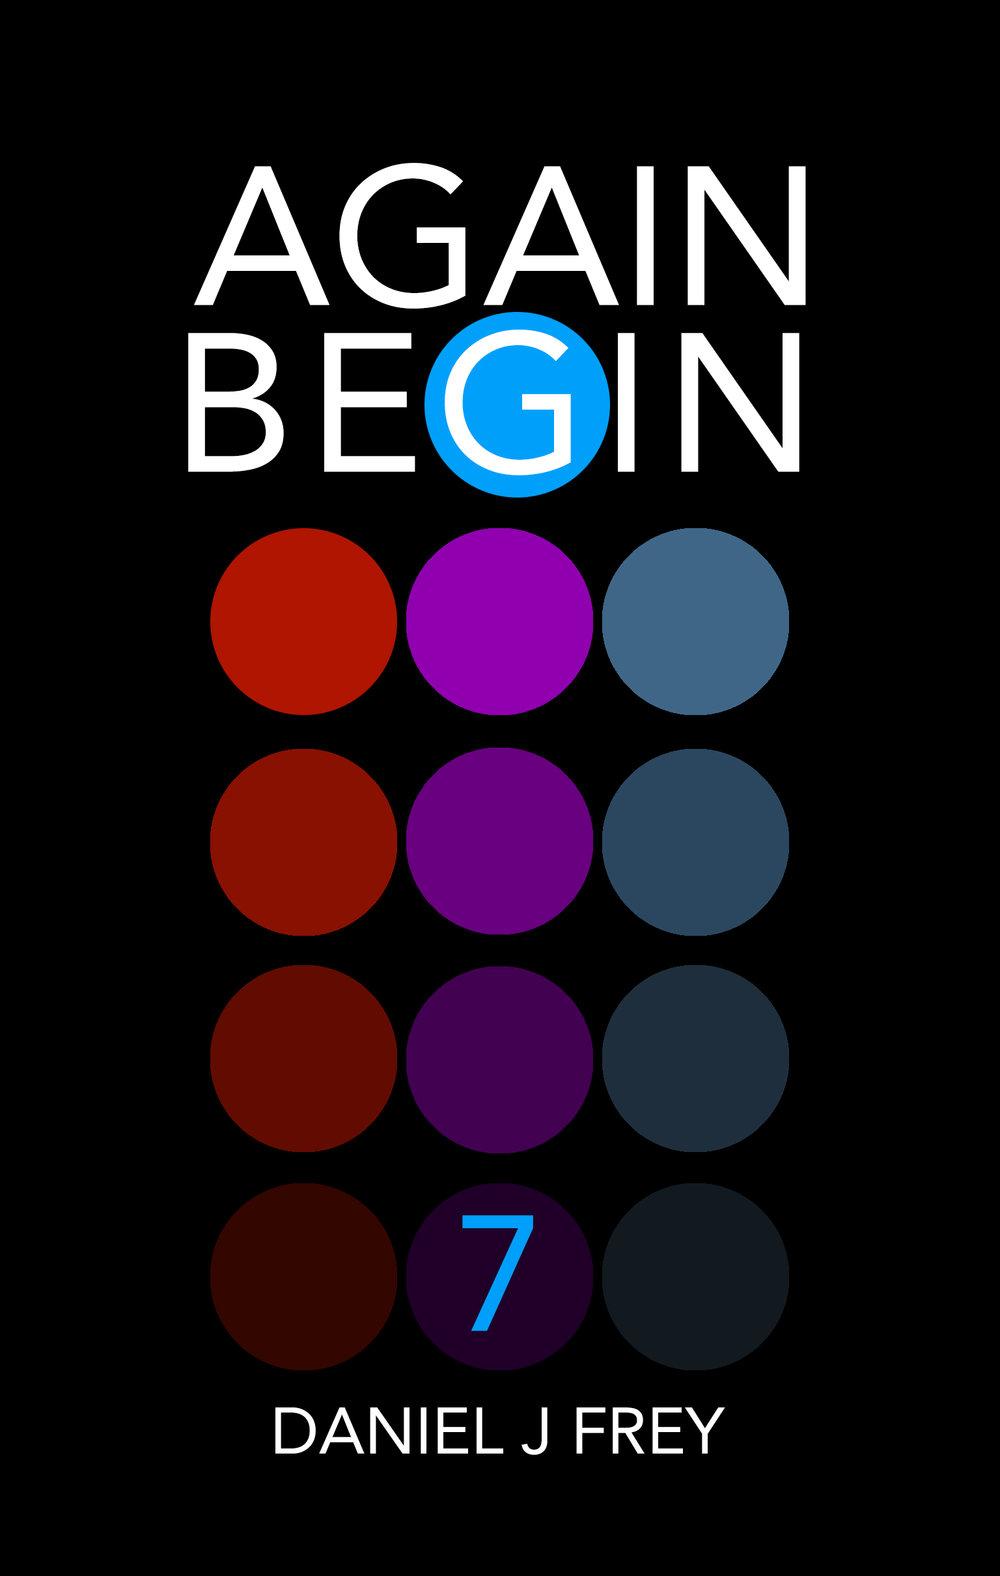 Again Begin 7 - Missing